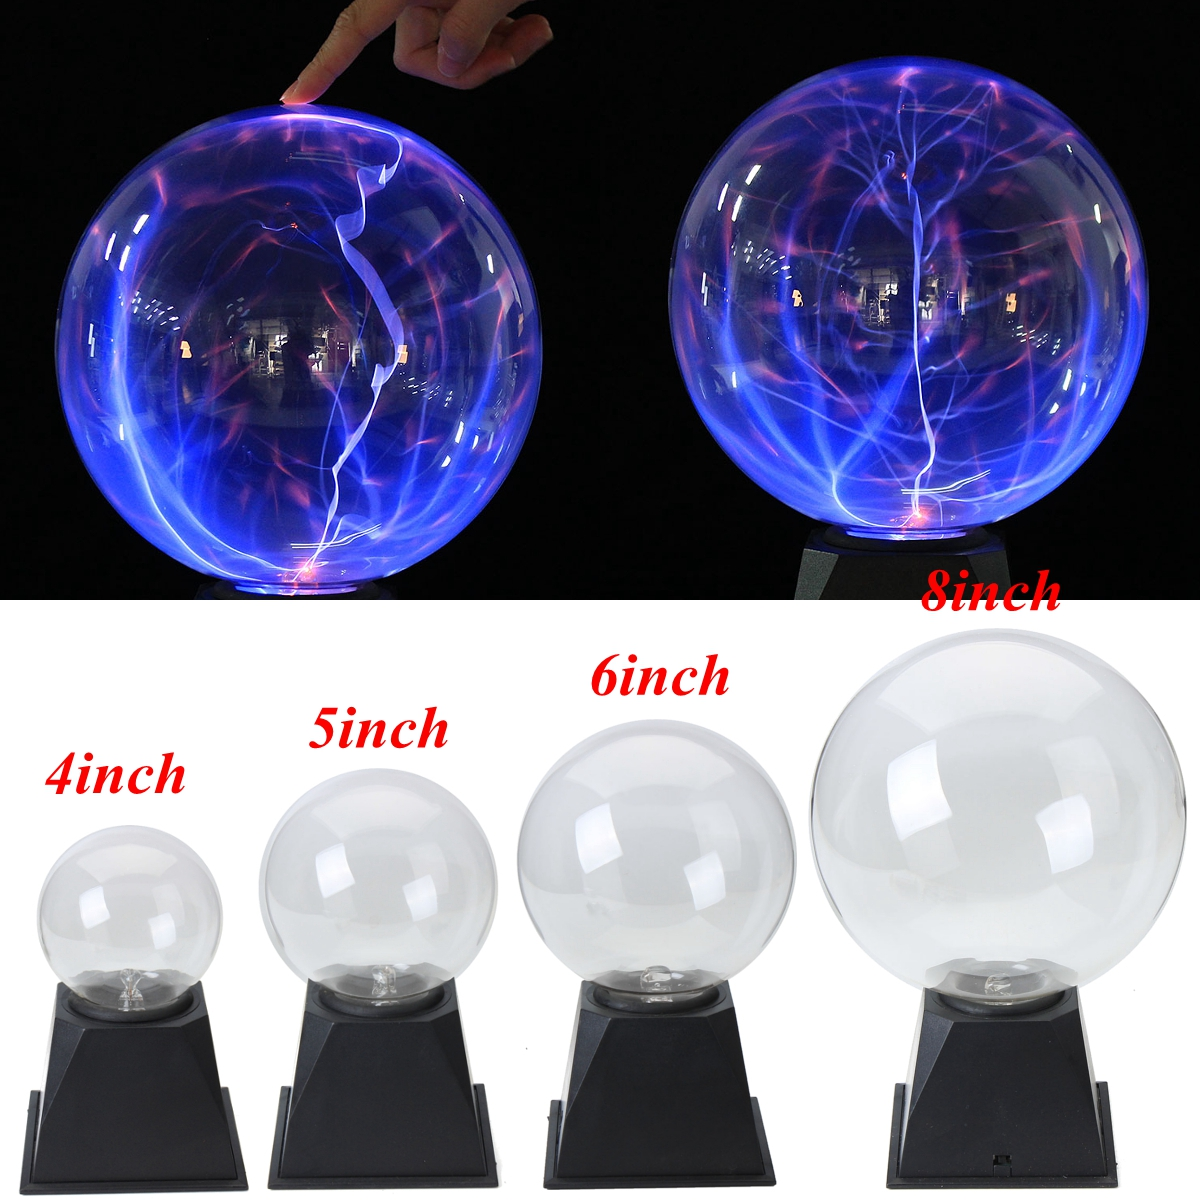 Voice control Glass Magic Plasma Ball Light 4 5 6 8 inch Table Lights Sphere Nightlight Magic Plasma Night Lamp Gift For Kids